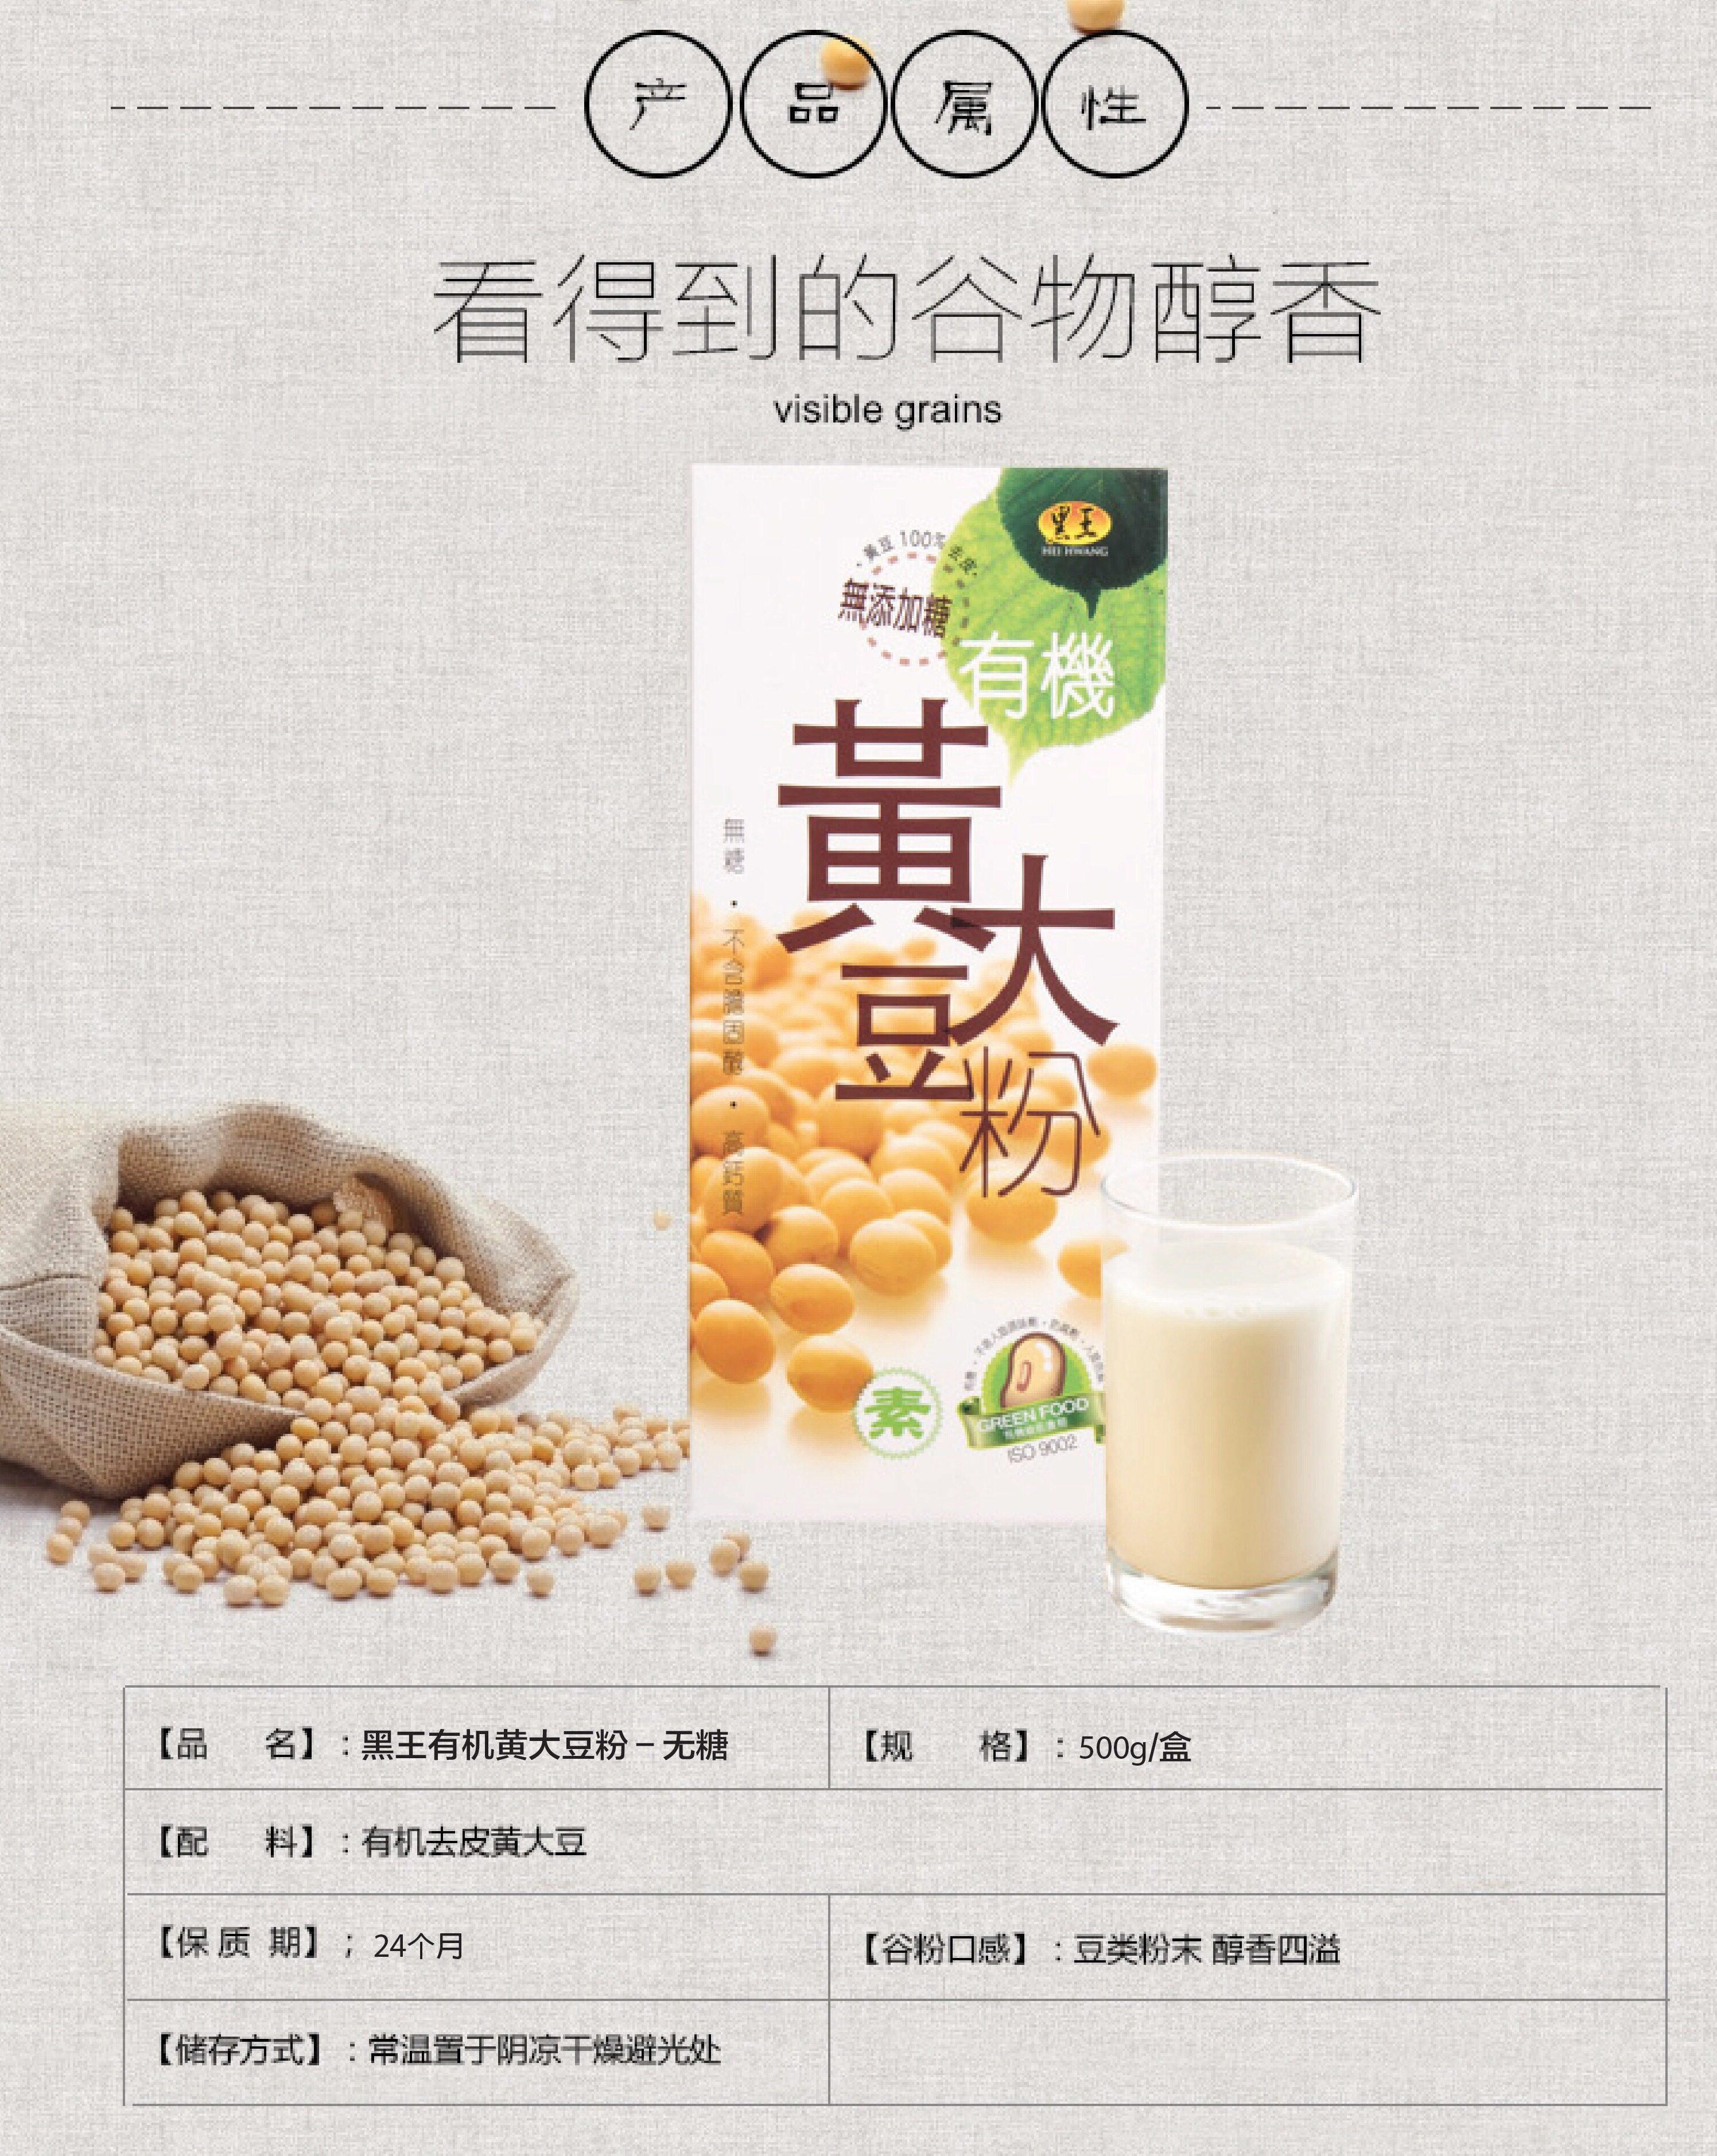 Hei Hwang Organic Soya Bean Powder Sachet (No Sugar) 有機黃大豆粉 (無糖) 450g